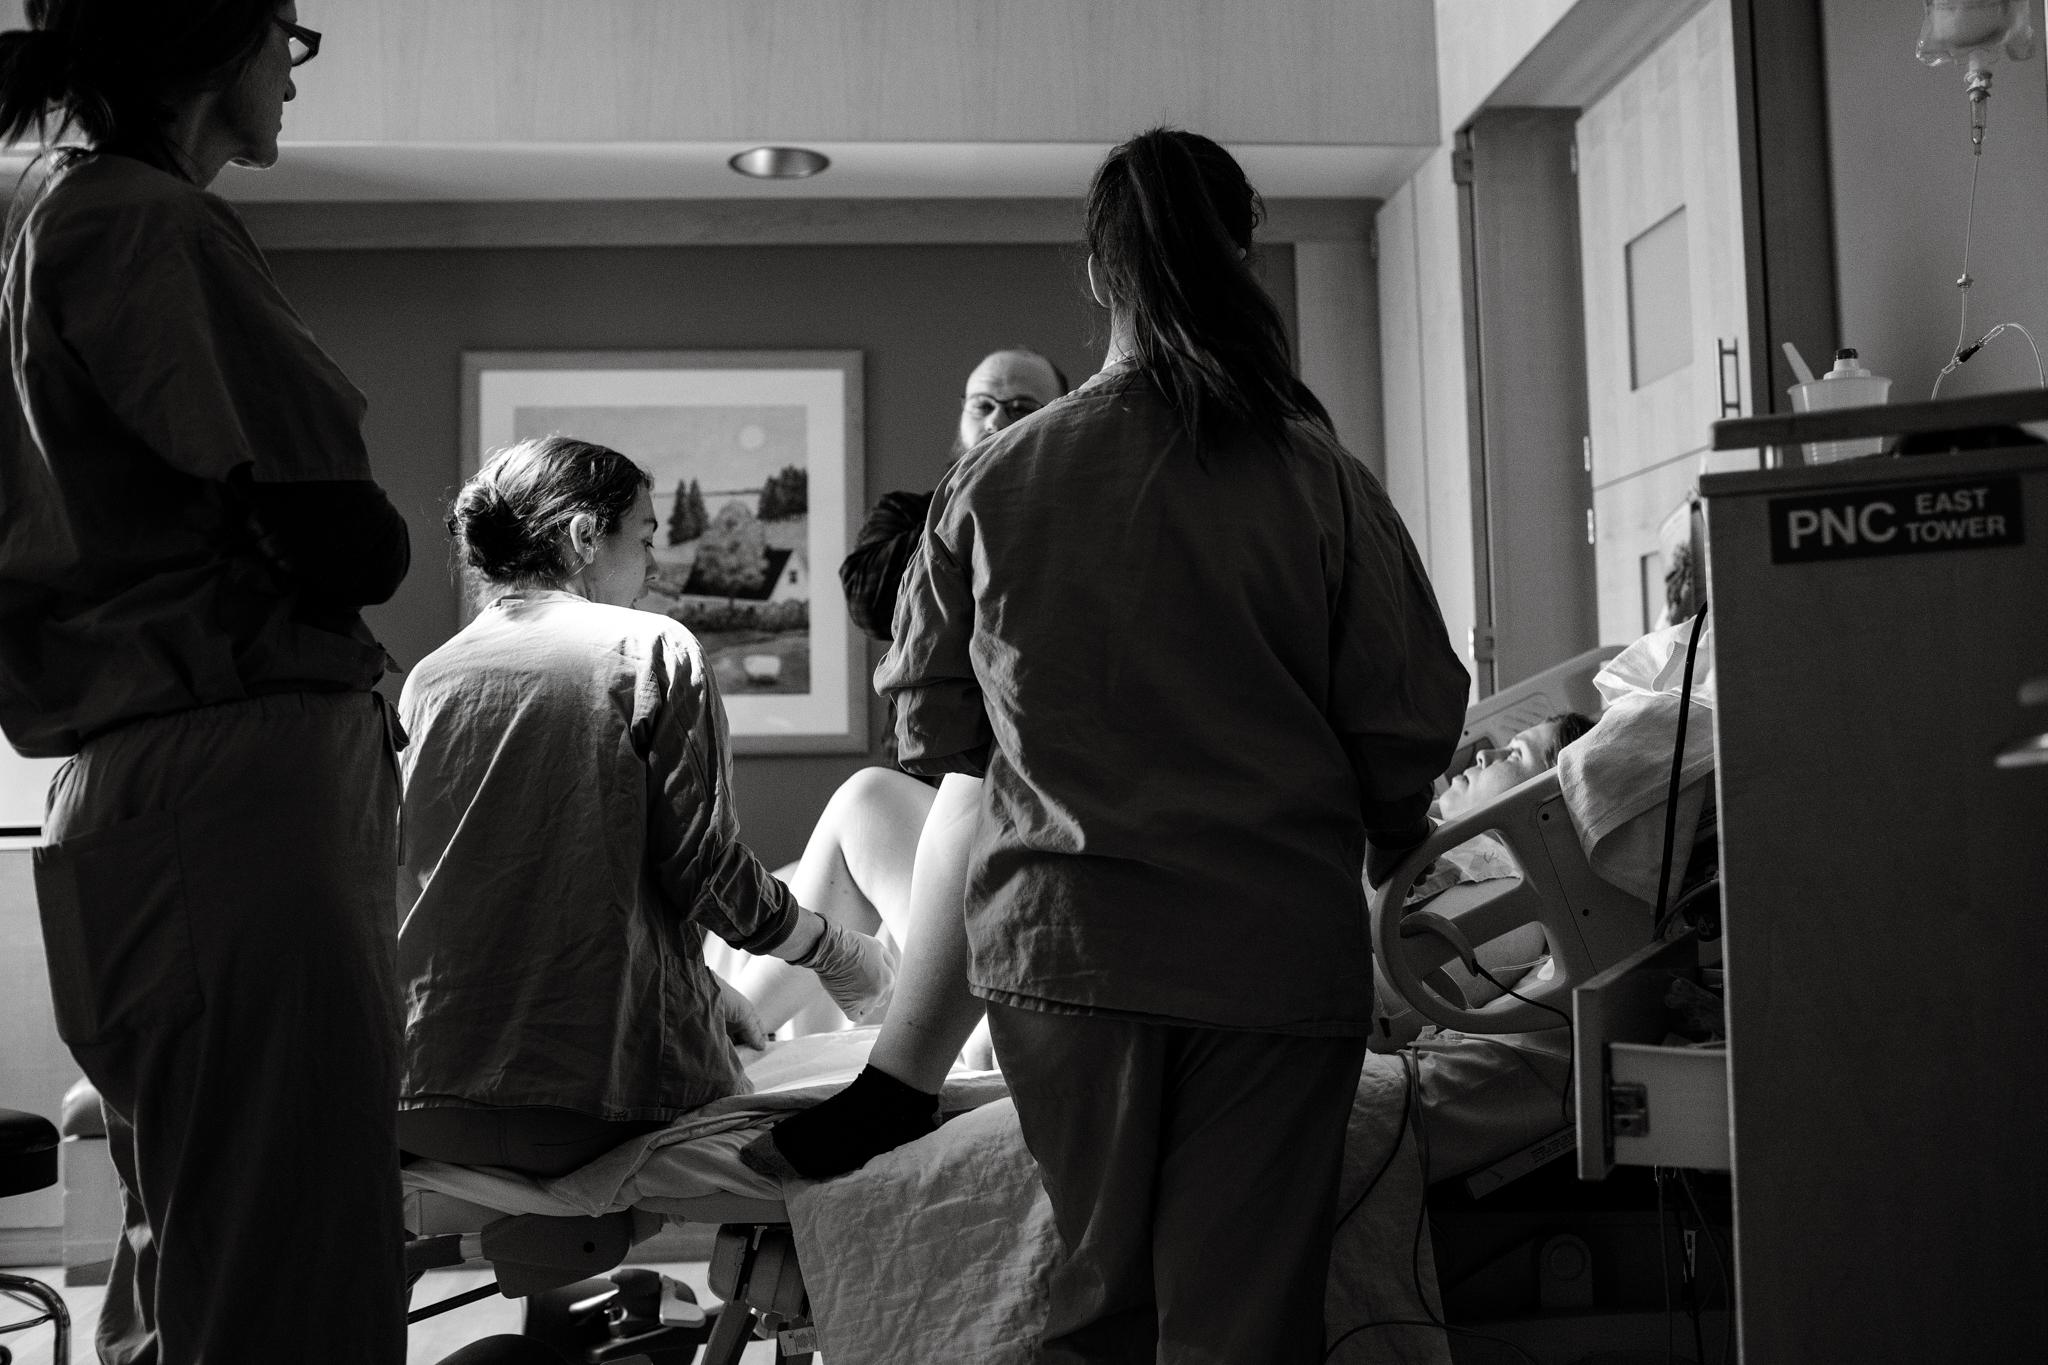 maine-birth-photographer-stepheneycollins -10.jpg